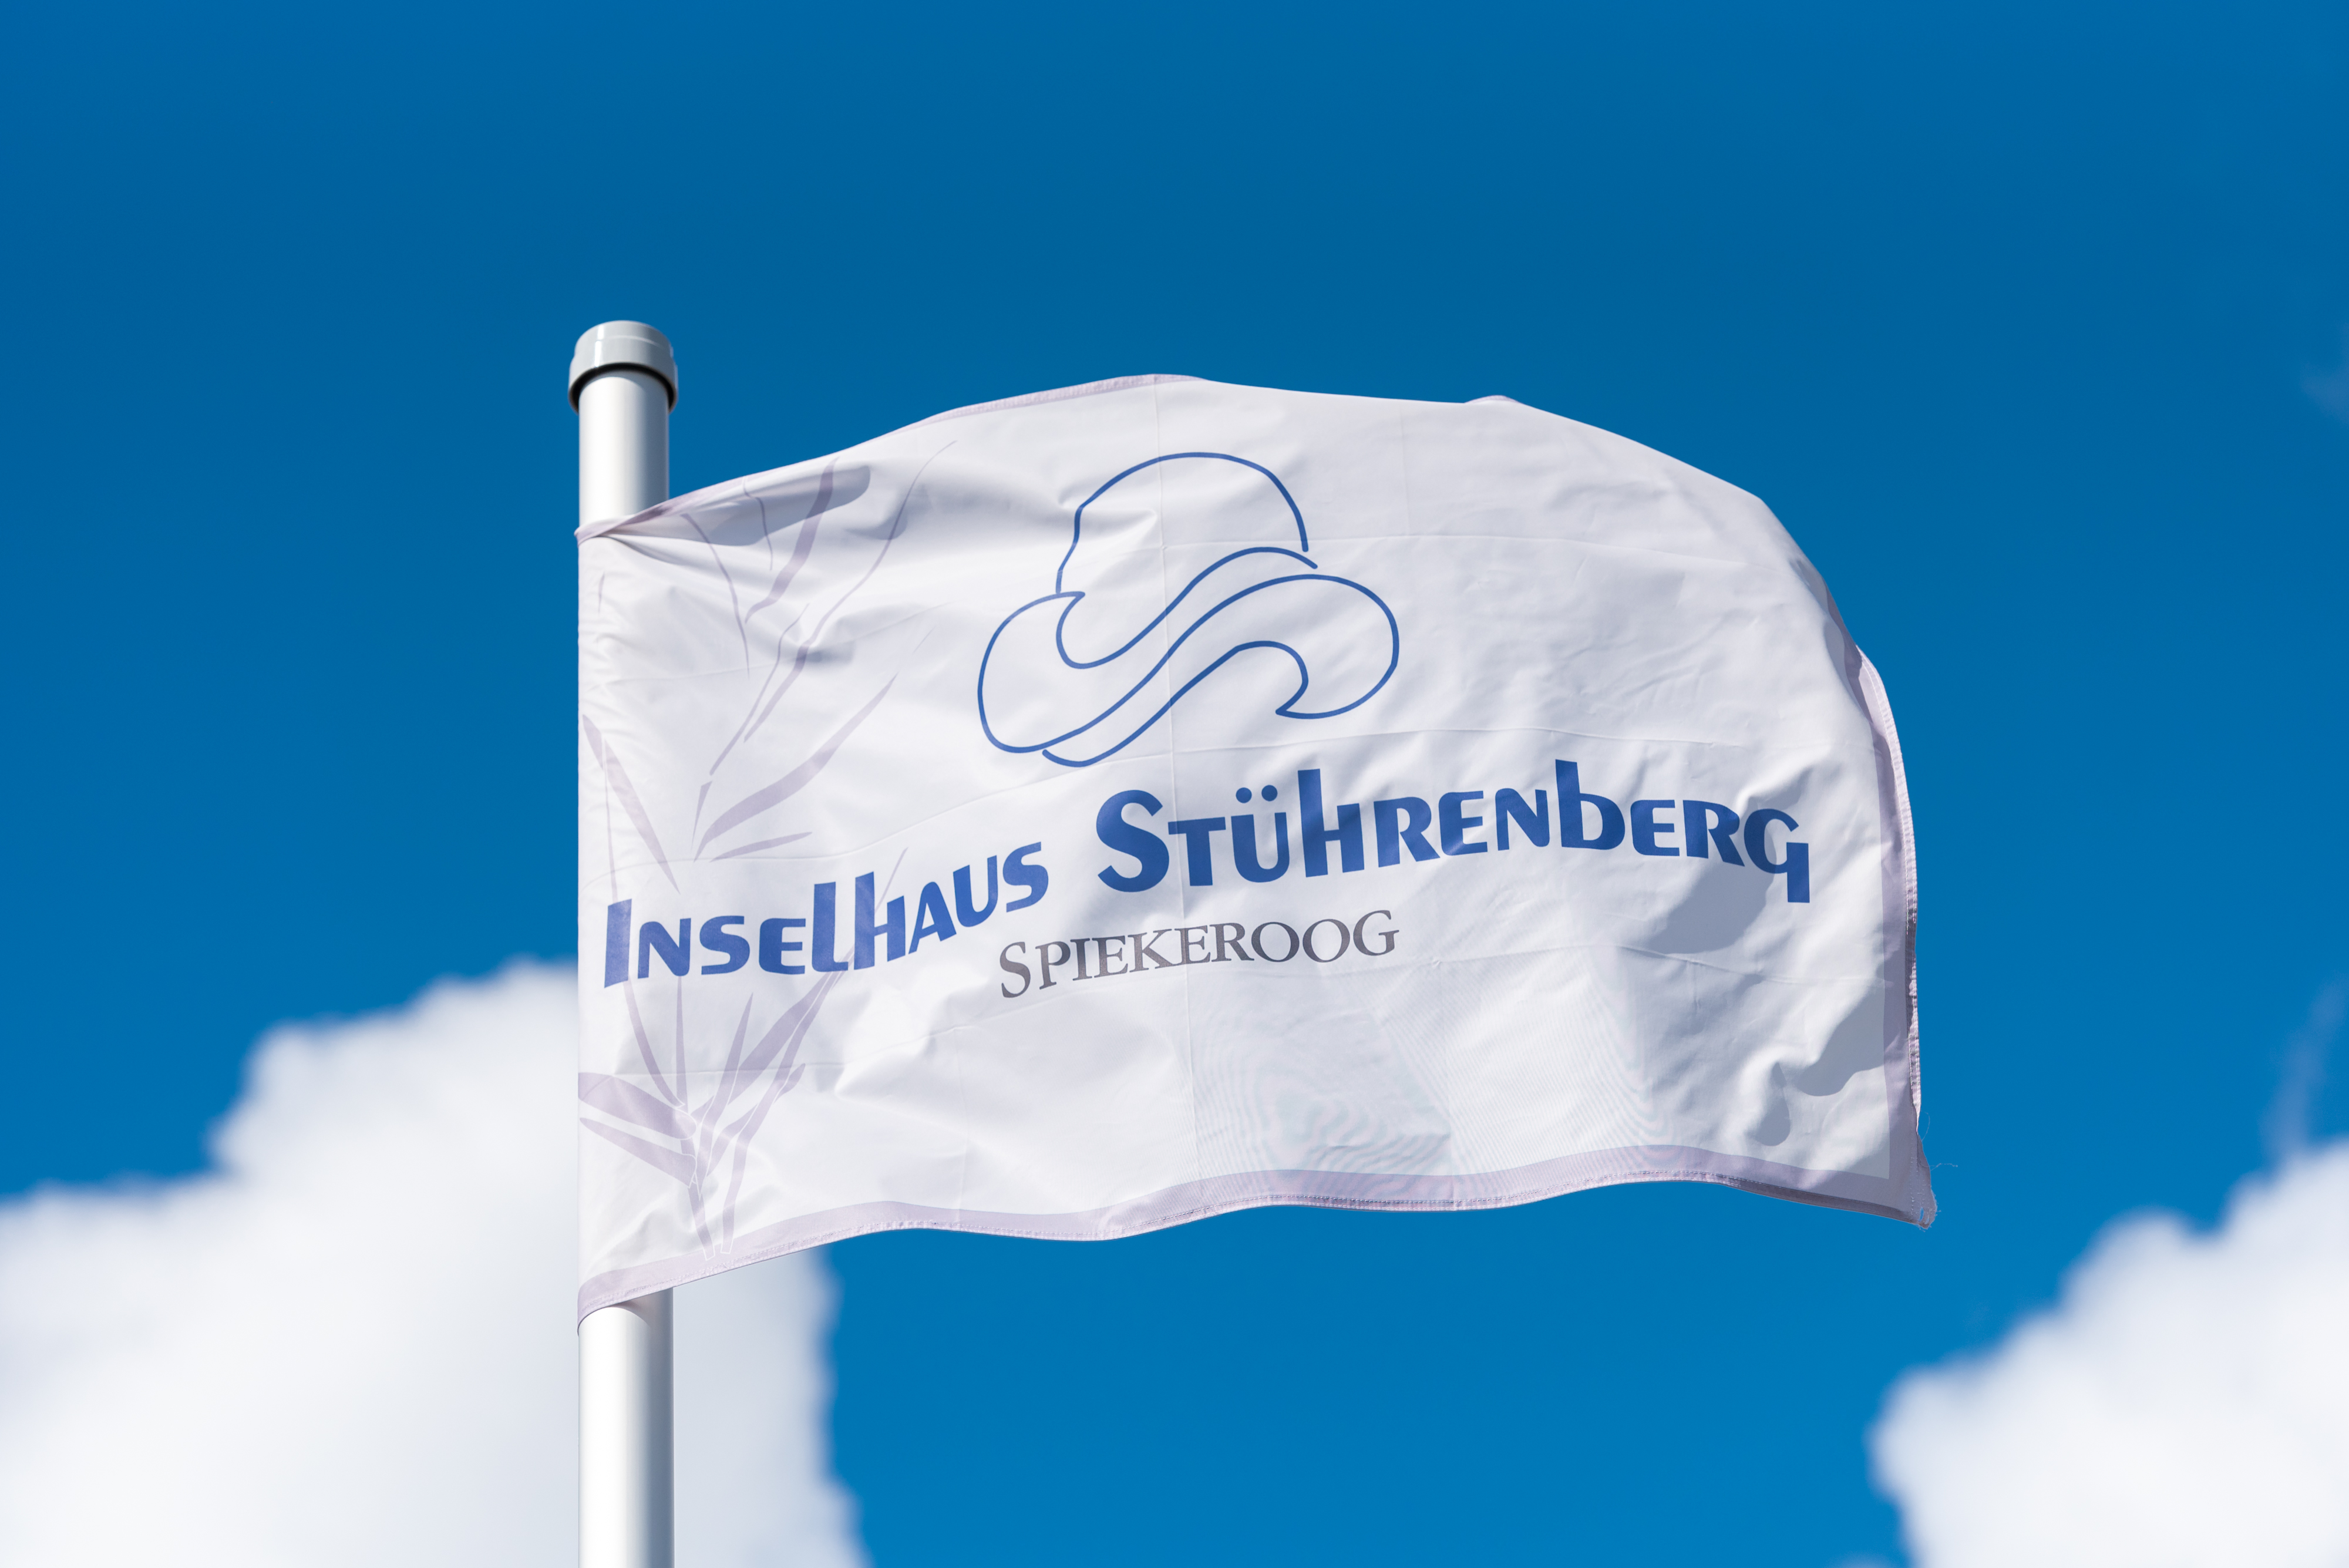 Inselhaus Stührenberg